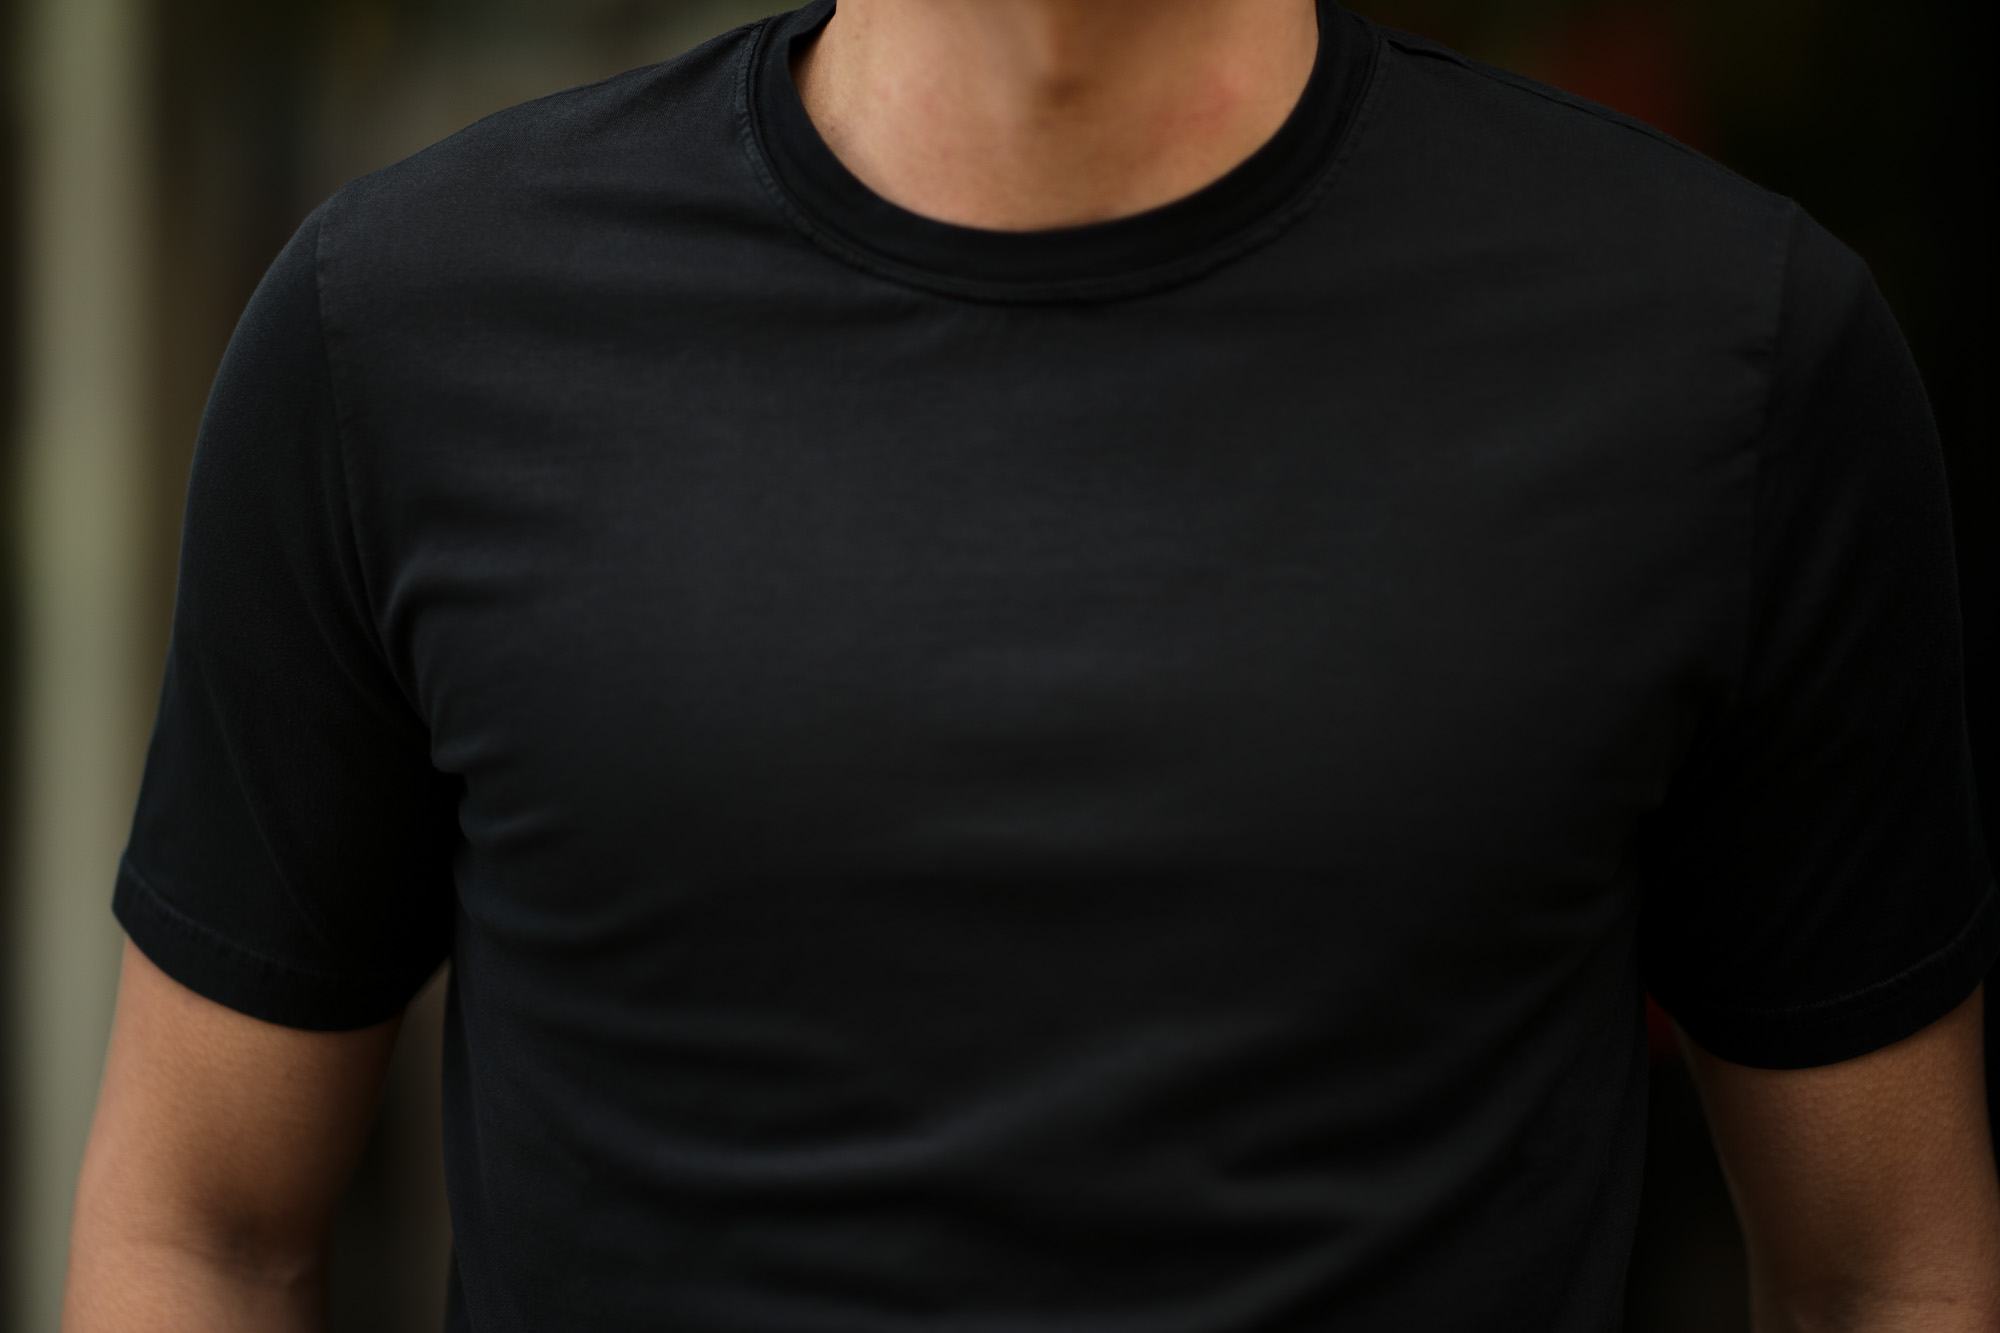 FEDELI(フェデーリ) Crew Neck T-shirt (クルーネック Tシャツ) ギザコットン Tシャツ BLACK (ブラック・36) made in italy (イタリア製) 2020 春夏 【ご予約受付中】愛知 名古屋 altoediritto アルトエデリット TEE